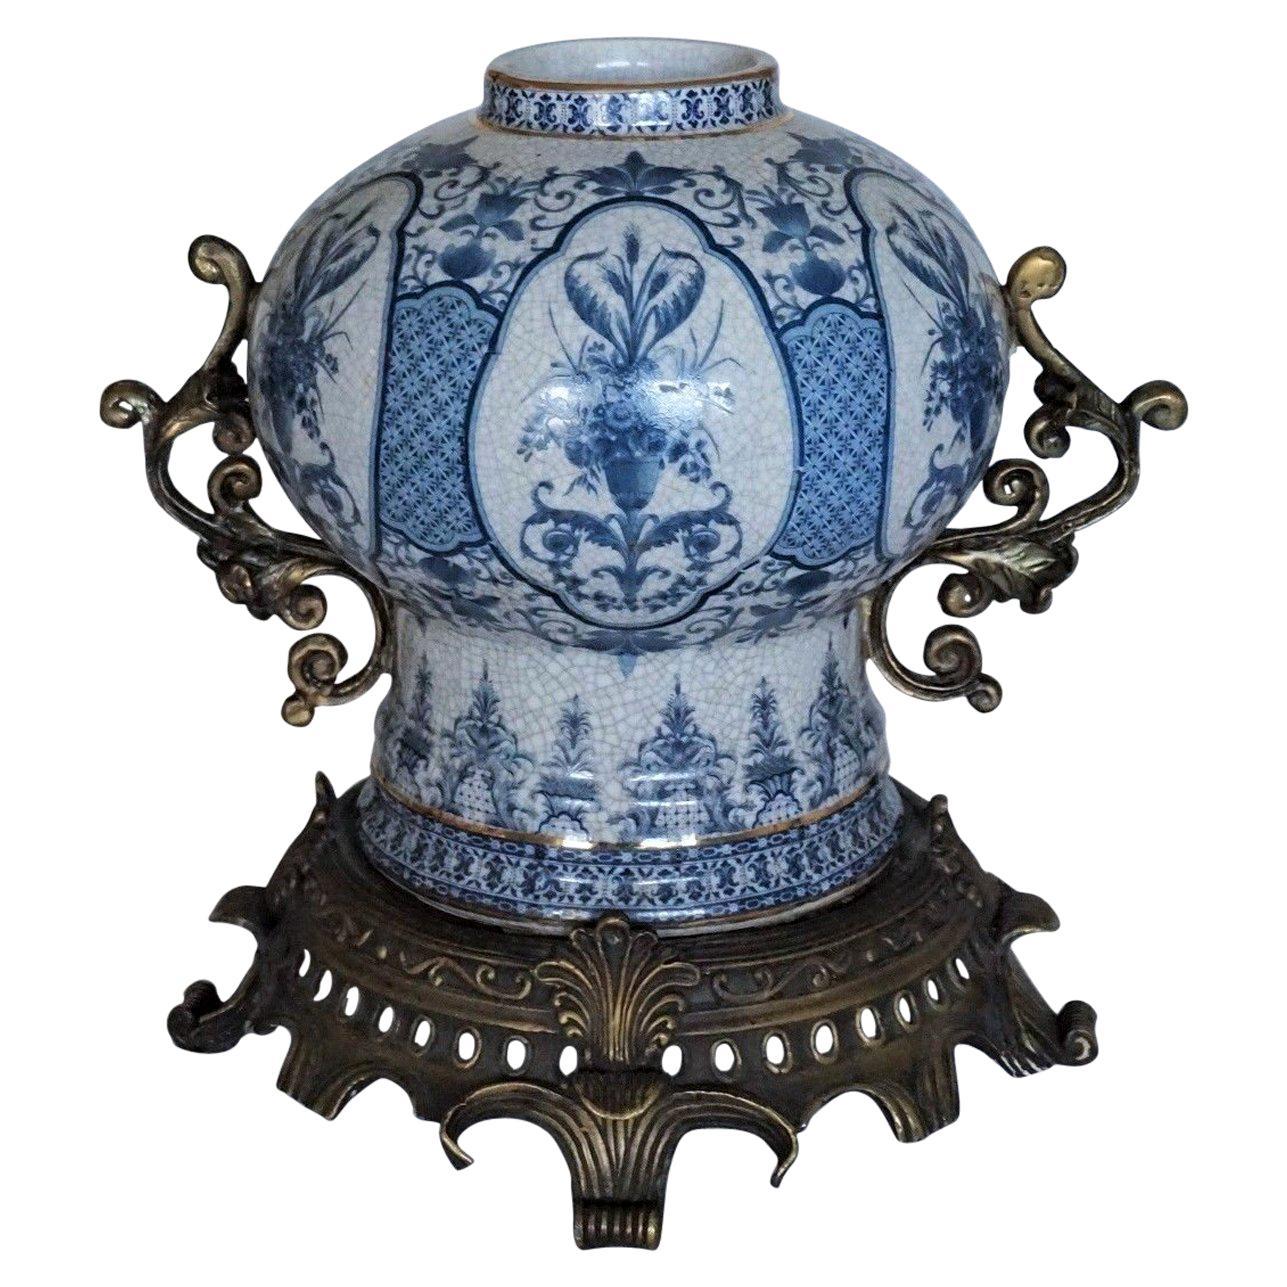 Transfer Decorated Chinoiserie Blue and White Porcelain Bronze Globular Jar